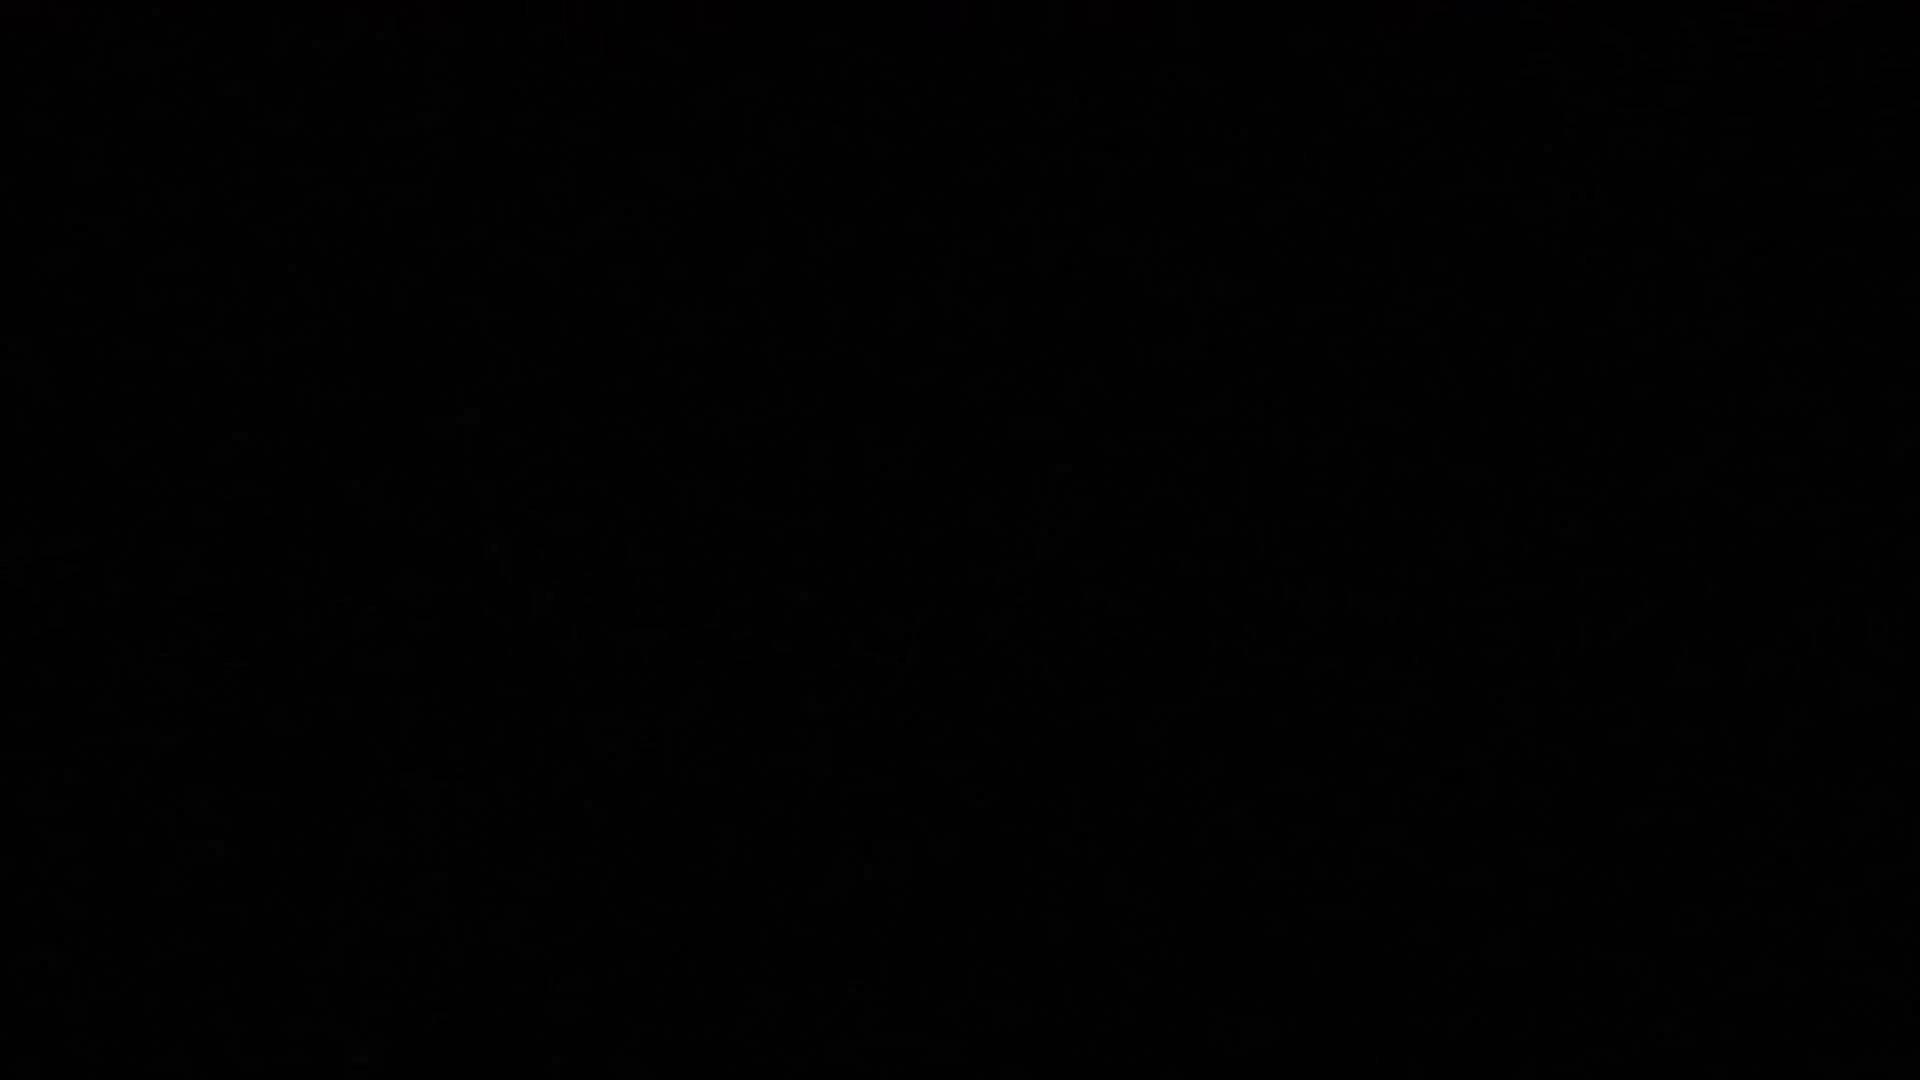 SPYさん初投稿!マンション覗き!5000K!ハイビジョン撮影VOL.05(元サッカー部員社会人) スポーツマン  38pic 37